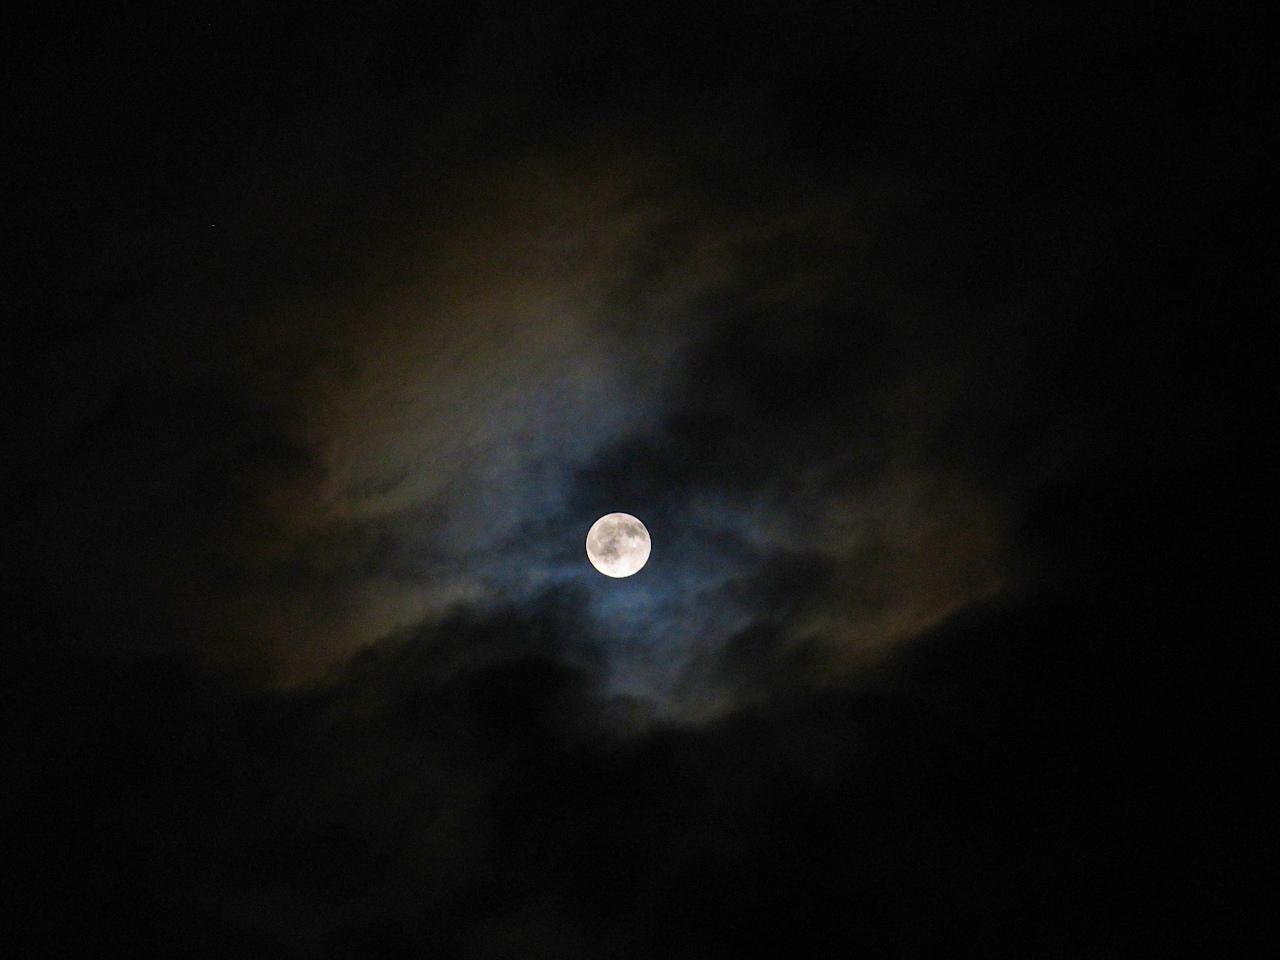 Lune.JPG.2049f5bf45cbb82d40c5409f01c0eacc.JPG